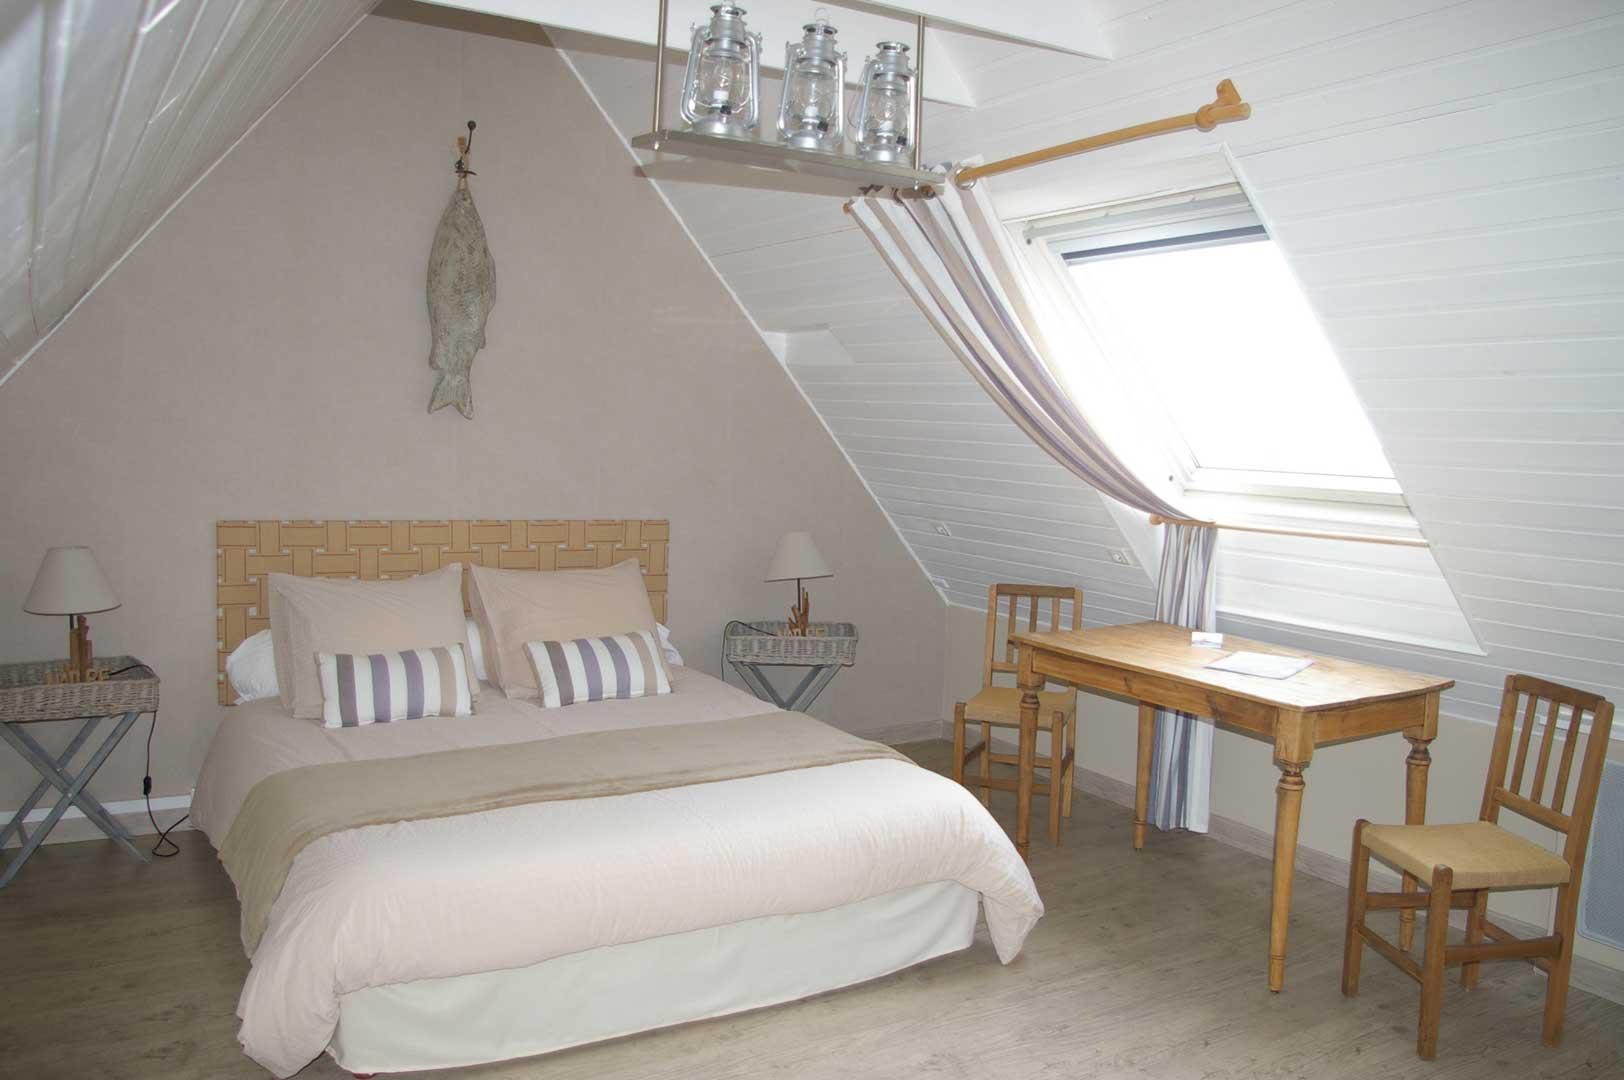 chambre d 39 h tes jusqu 39 5 personnes le colombier bretagne cote de granit rose perros guirec. Black Bedroom Furniture Sets. Home Design Ideas